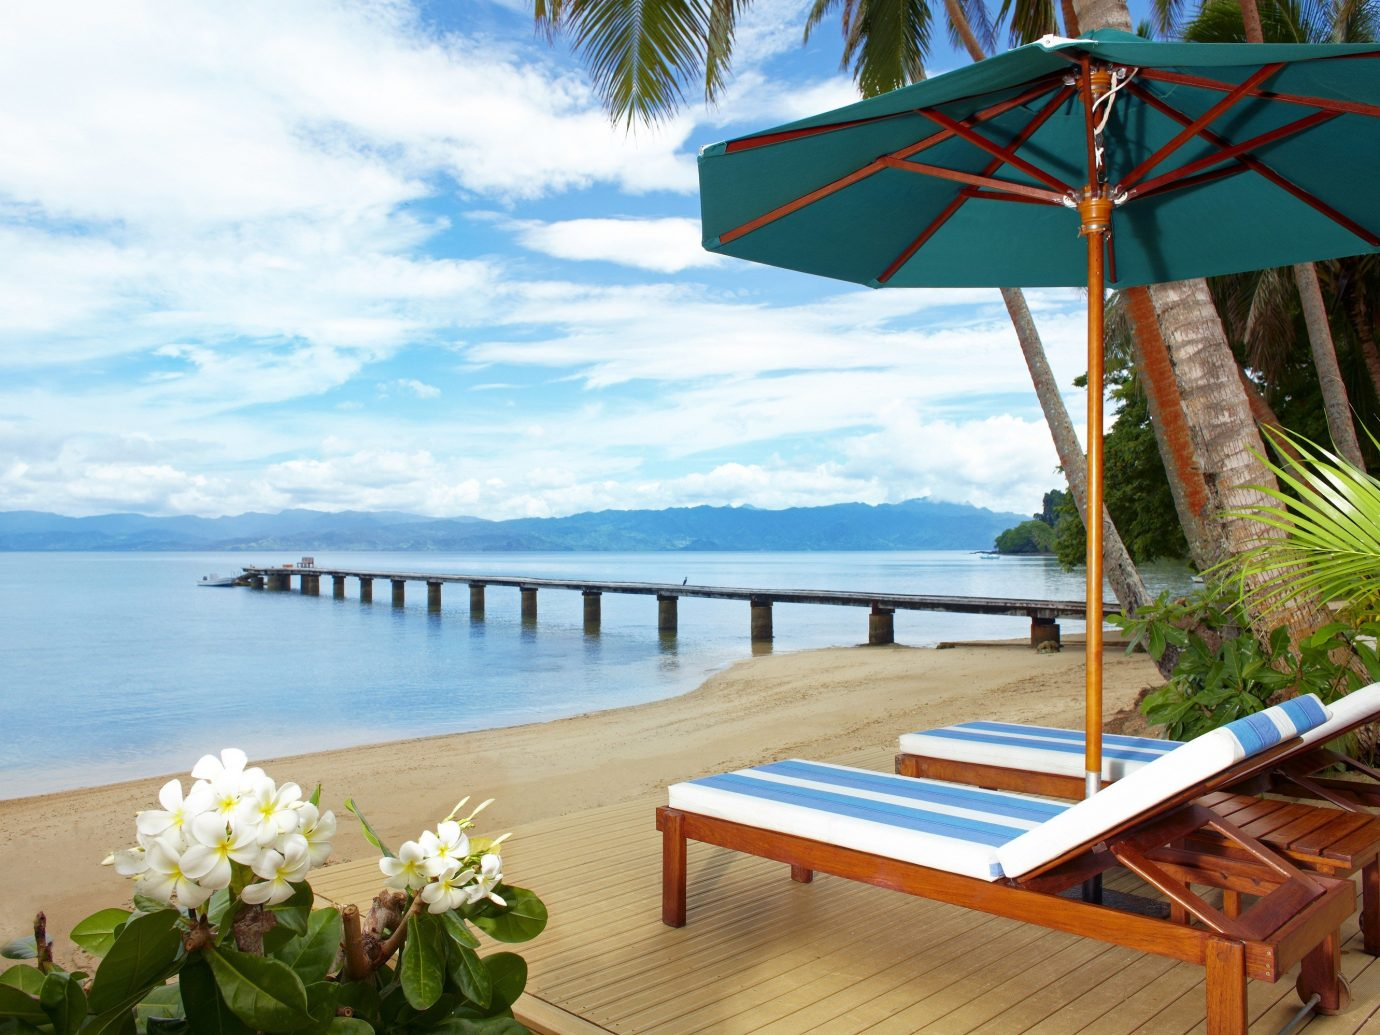 All-Inclusive Resorts Hotels Luxury Travel umbrella sky outdoor chair Resort Sea vacation accessory leisure real estate tourism tropics Beach outdoor furniture Ocean caribbean shore set furniture Deck